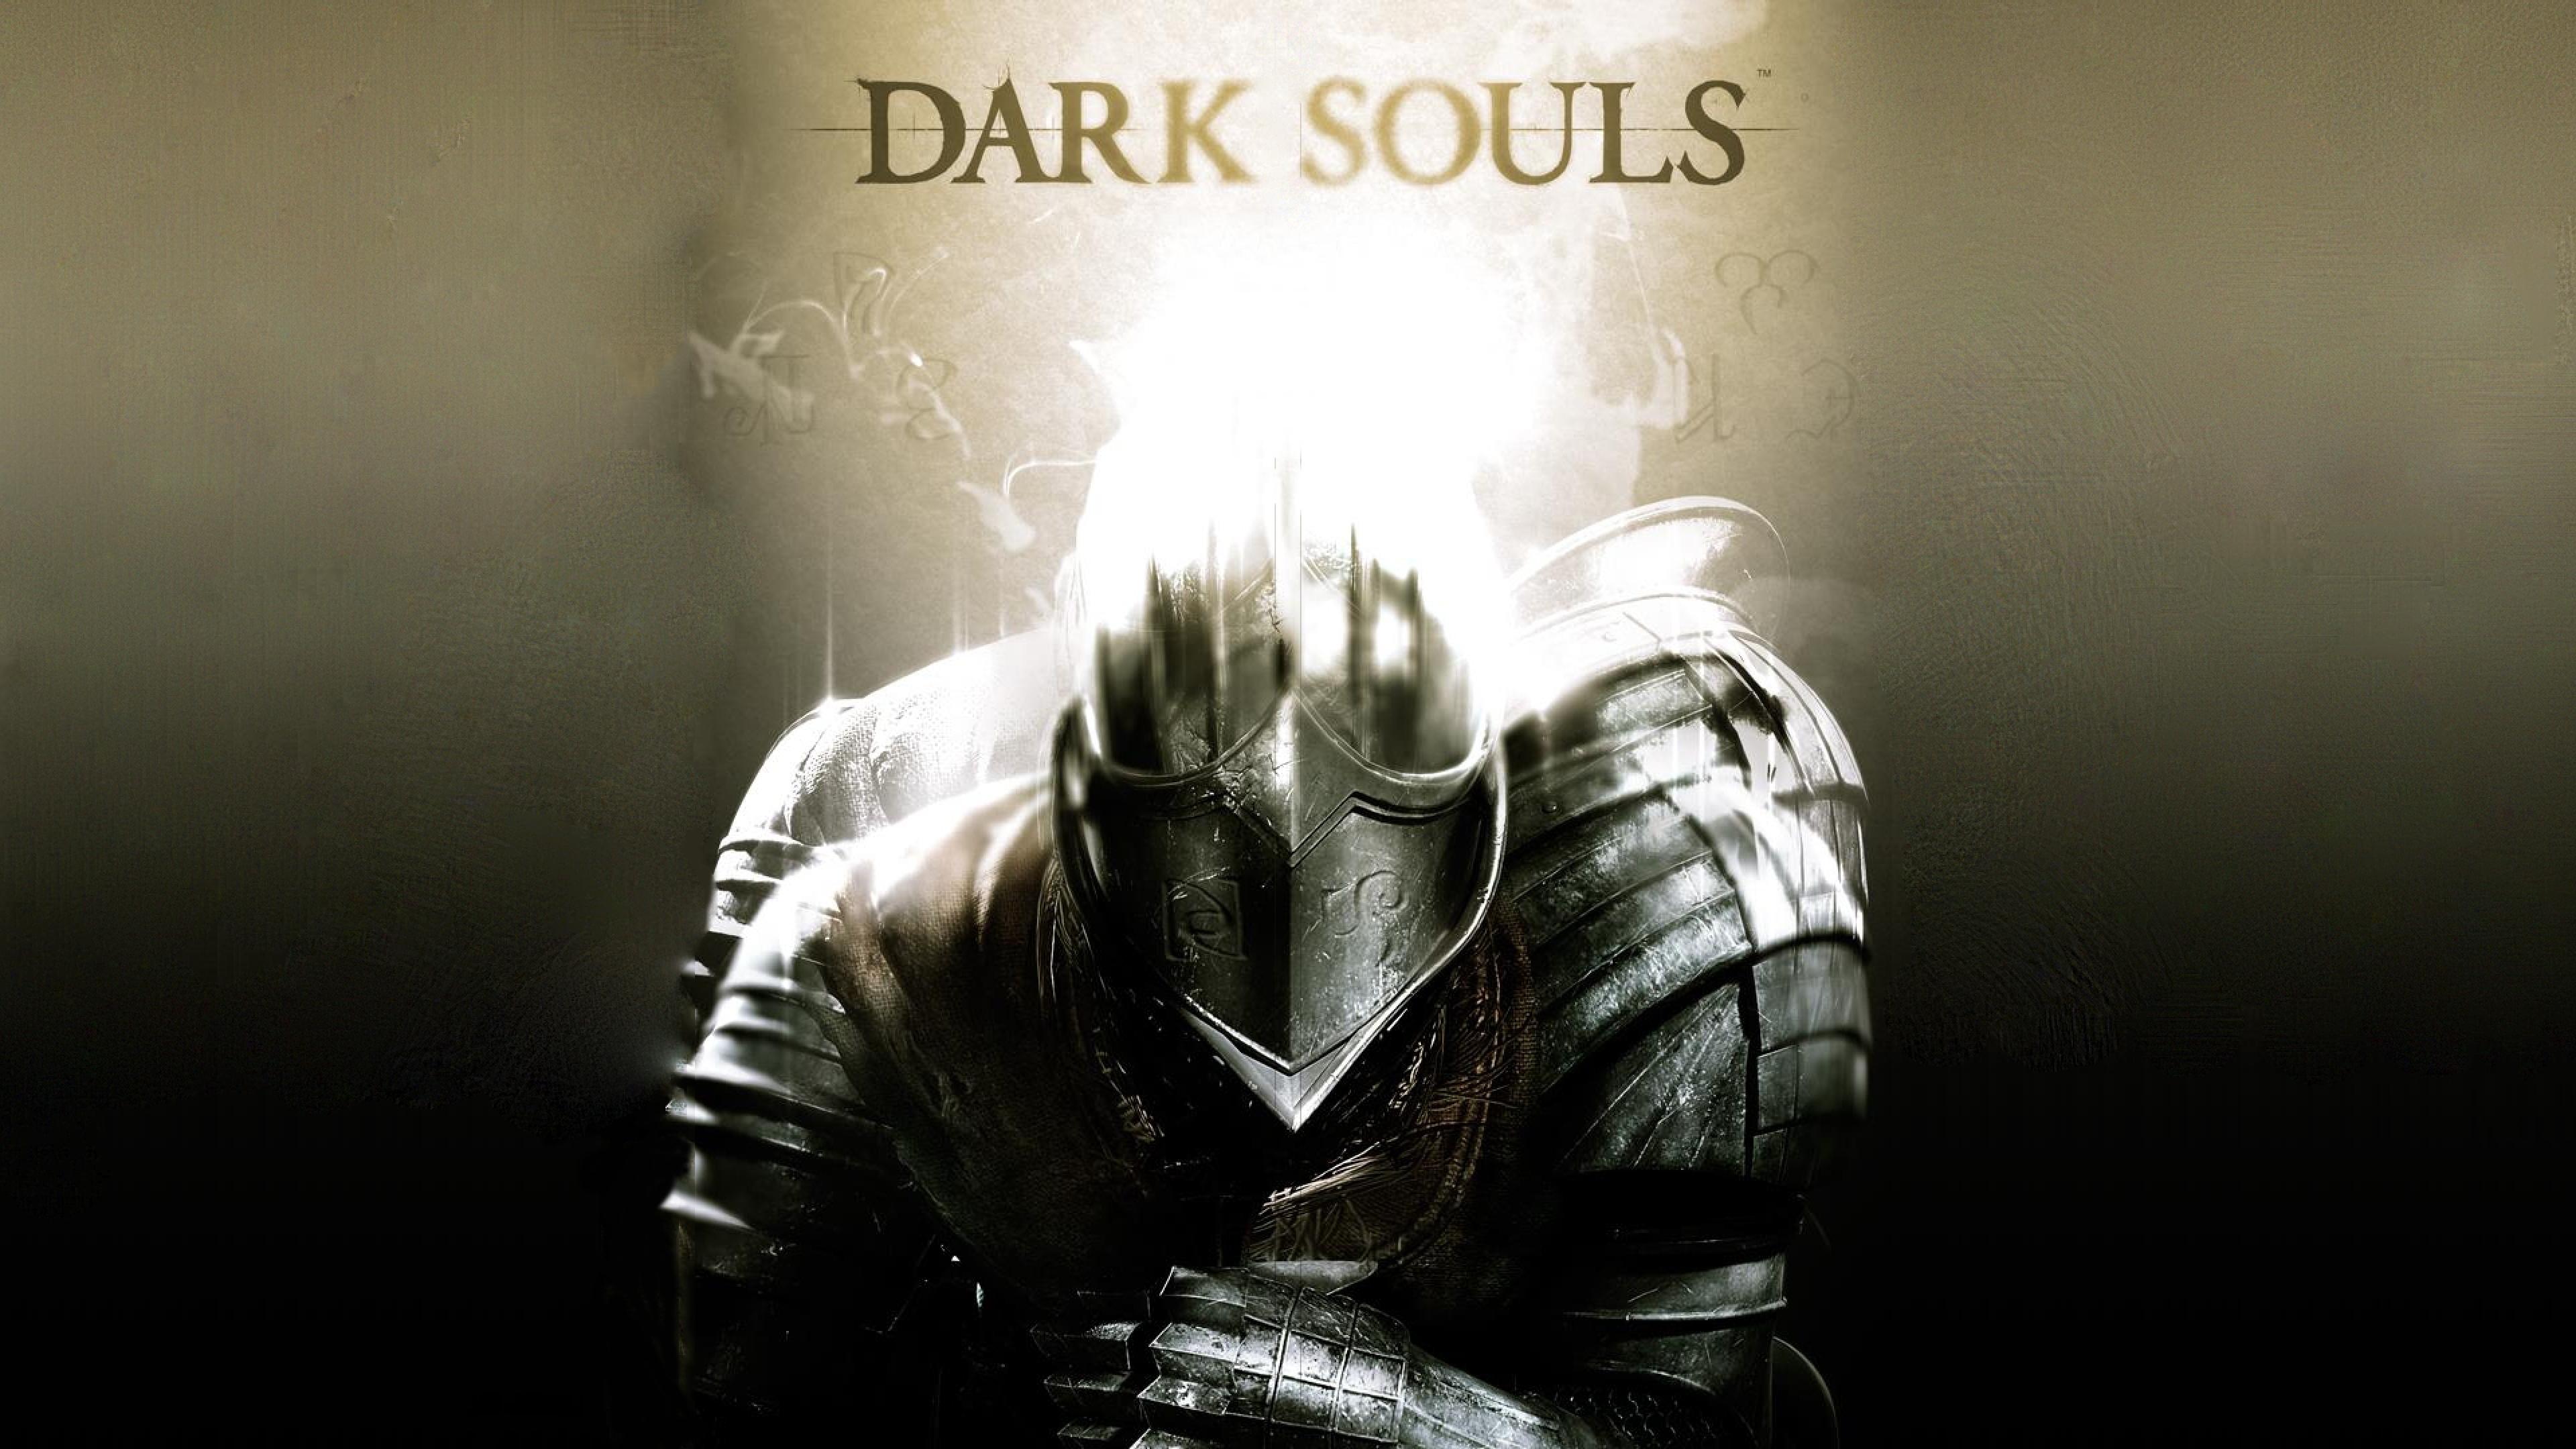 Download Wallpaper 3840x2160 dark souls armor light helmet 4K Ultra 3840x2160